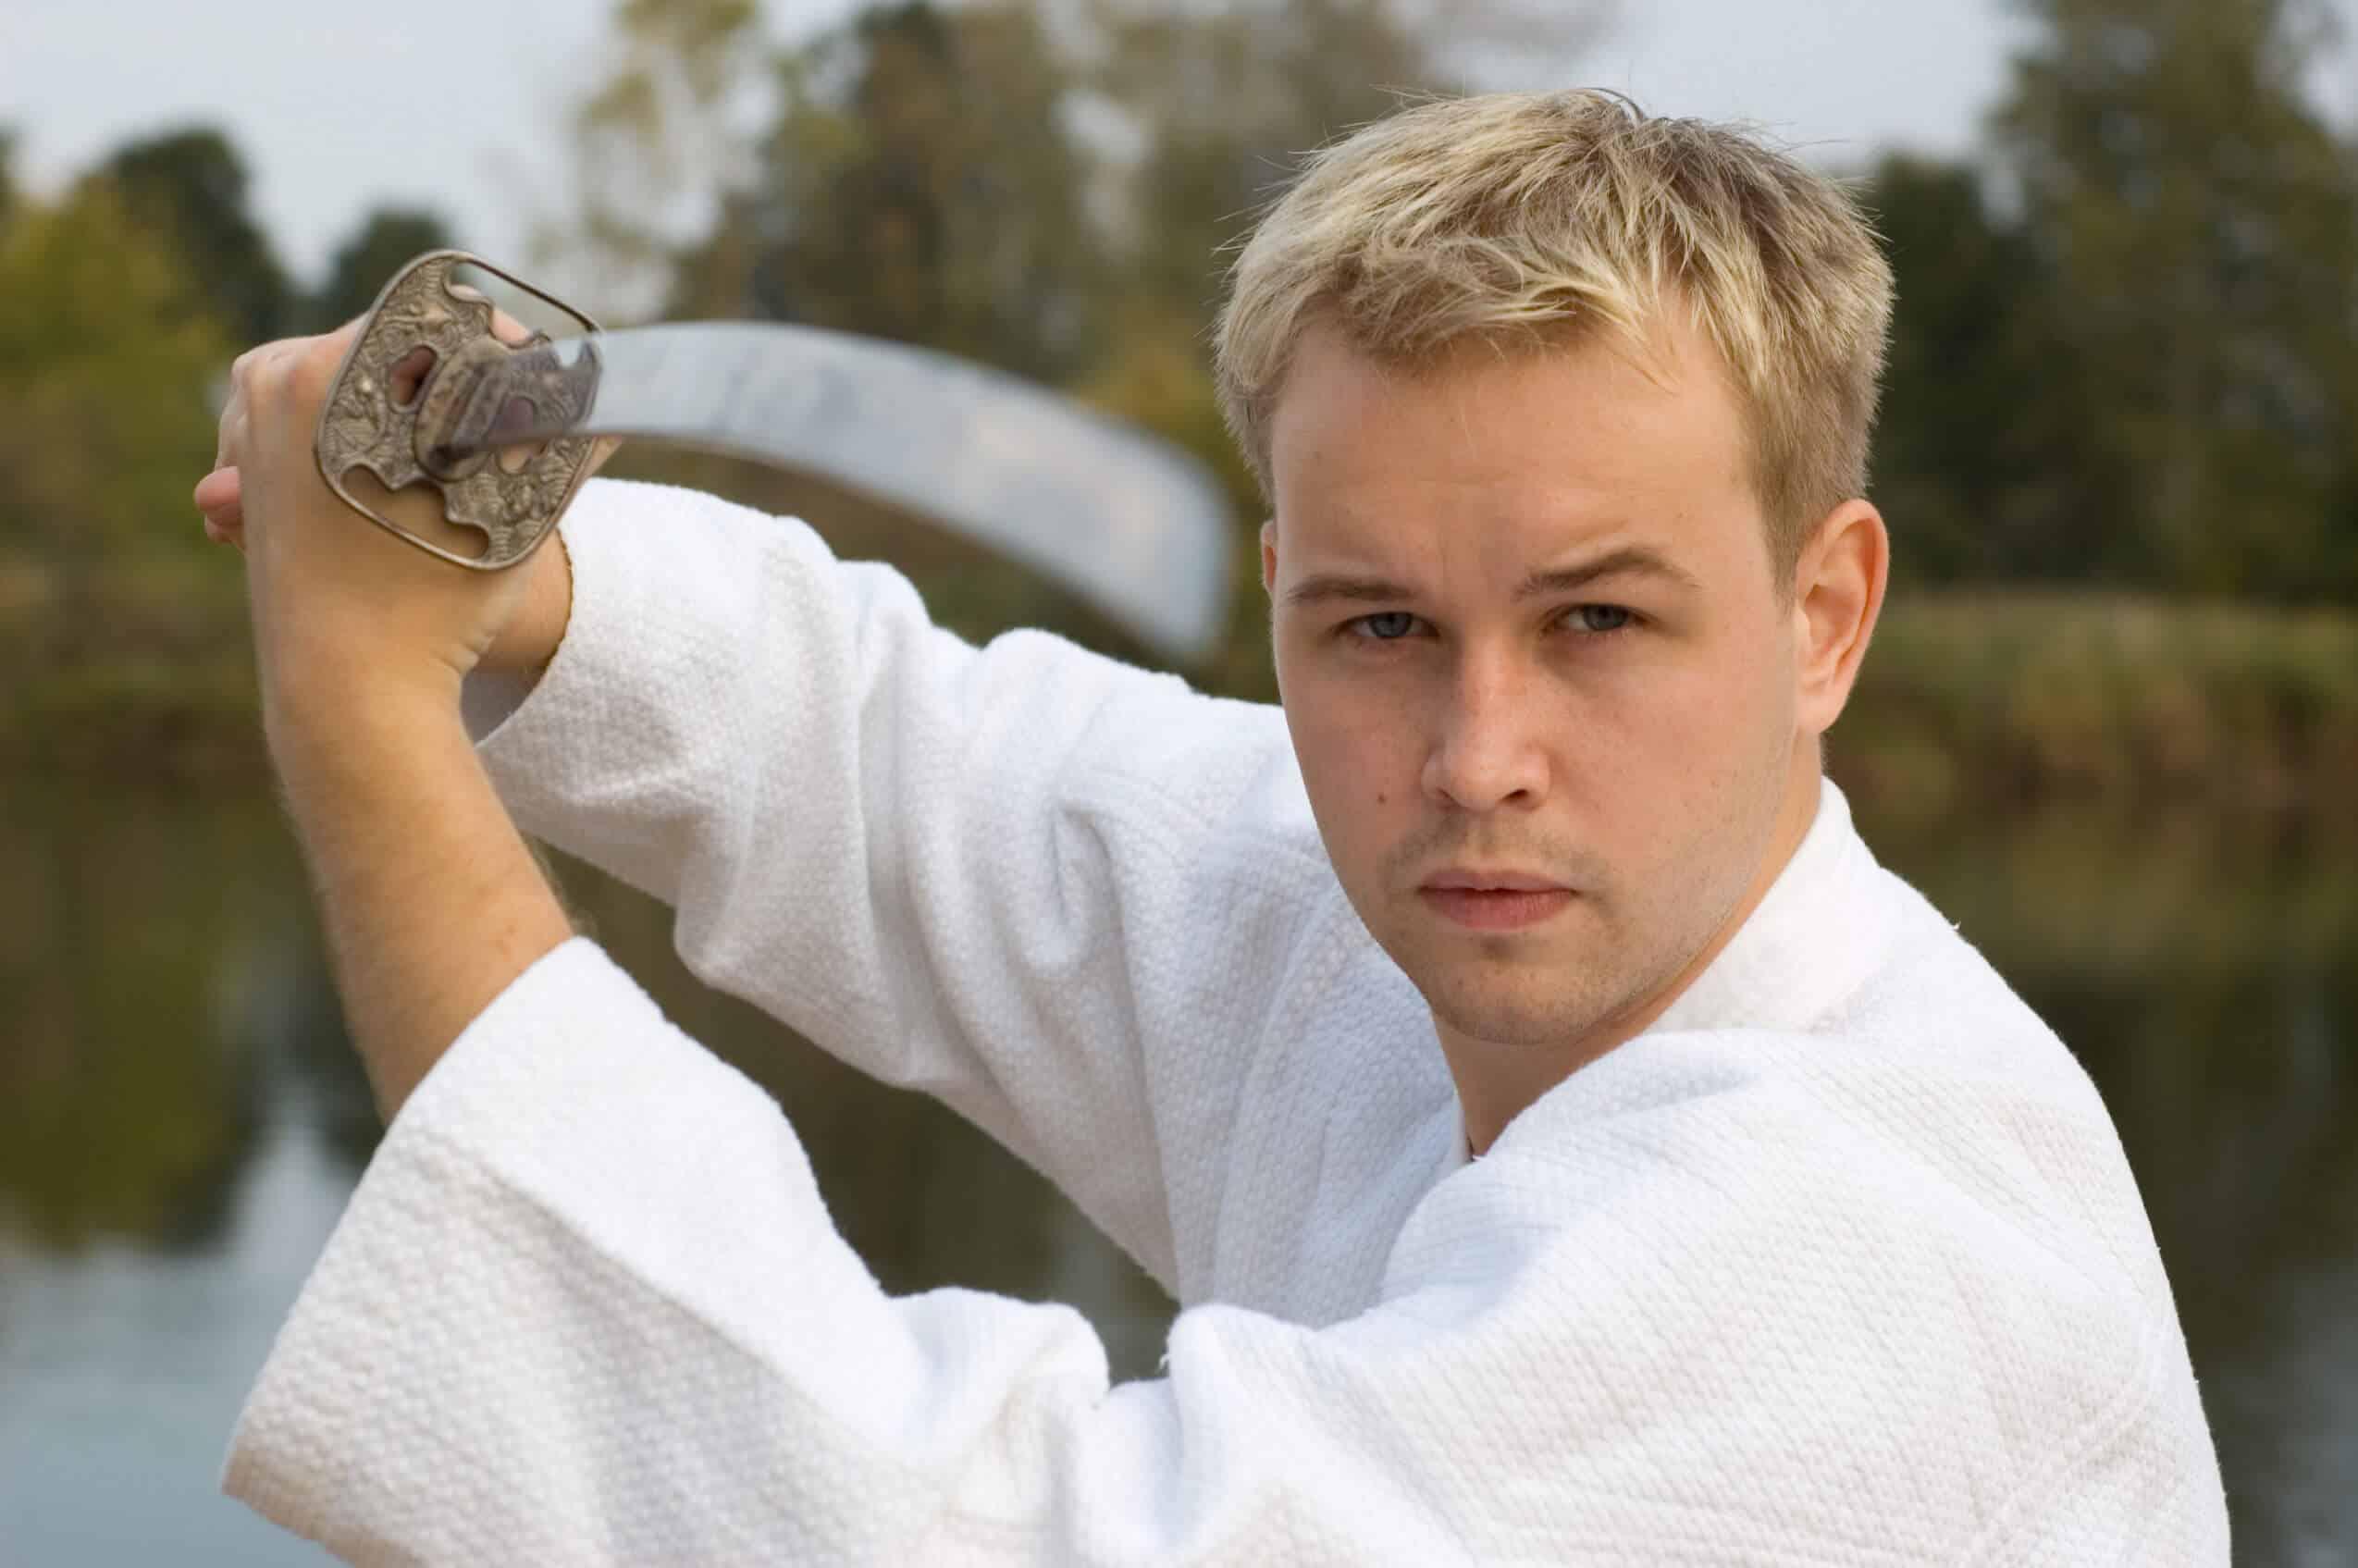 Martial Arts Lessons for Adults in San Antonio TX - Samurai Sword Posing Blog